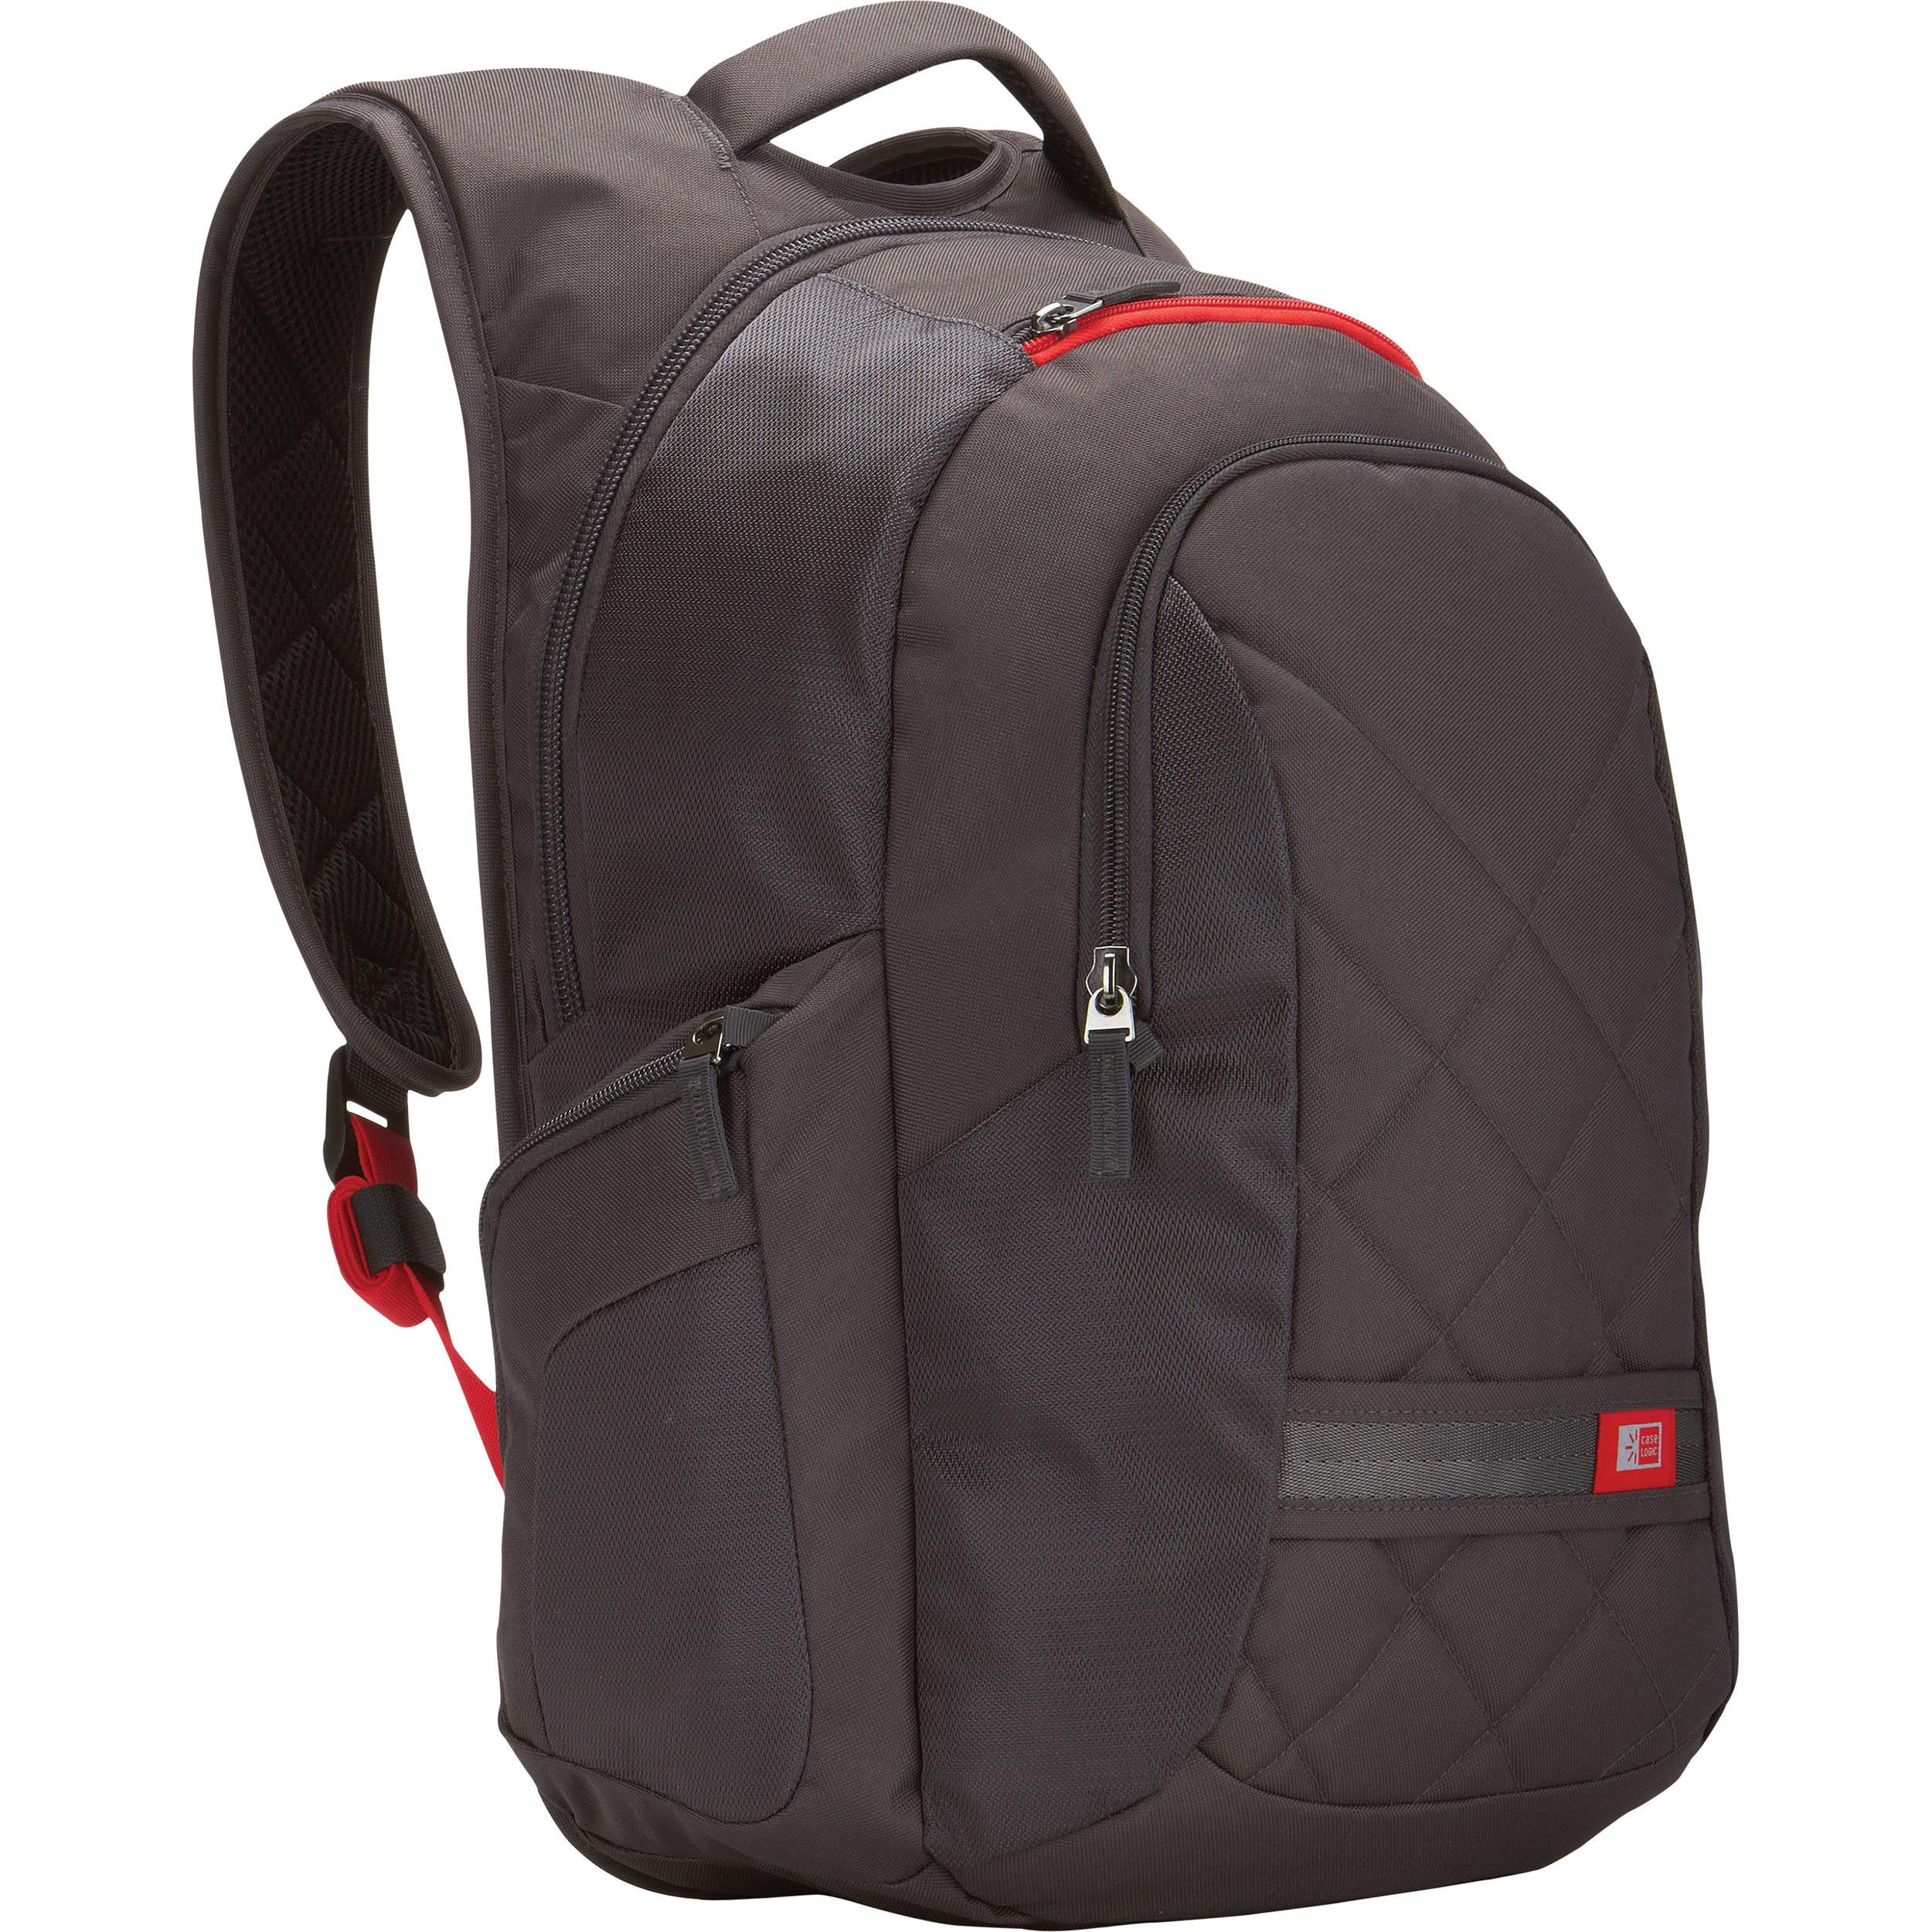 Case_Logic_DLBP_116_DG_16_Laptop_Backpack_Dark_859705.jpg